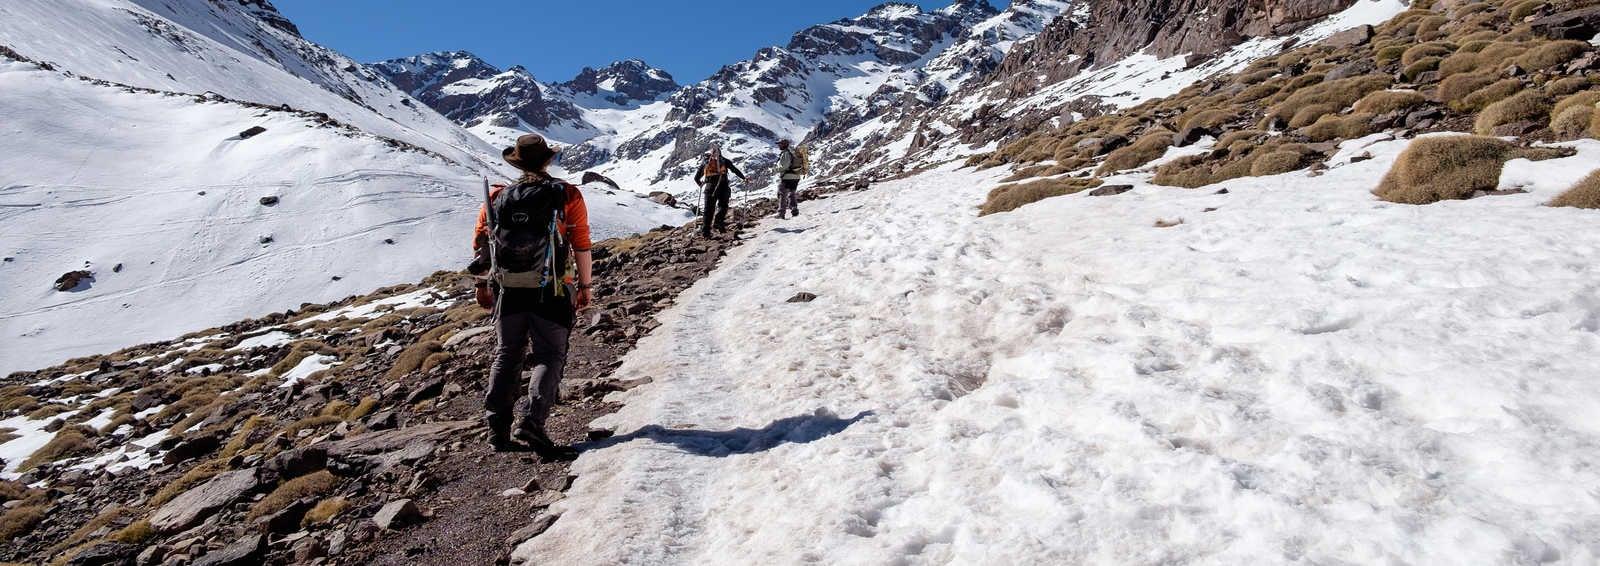 Winter summit of Toubkal